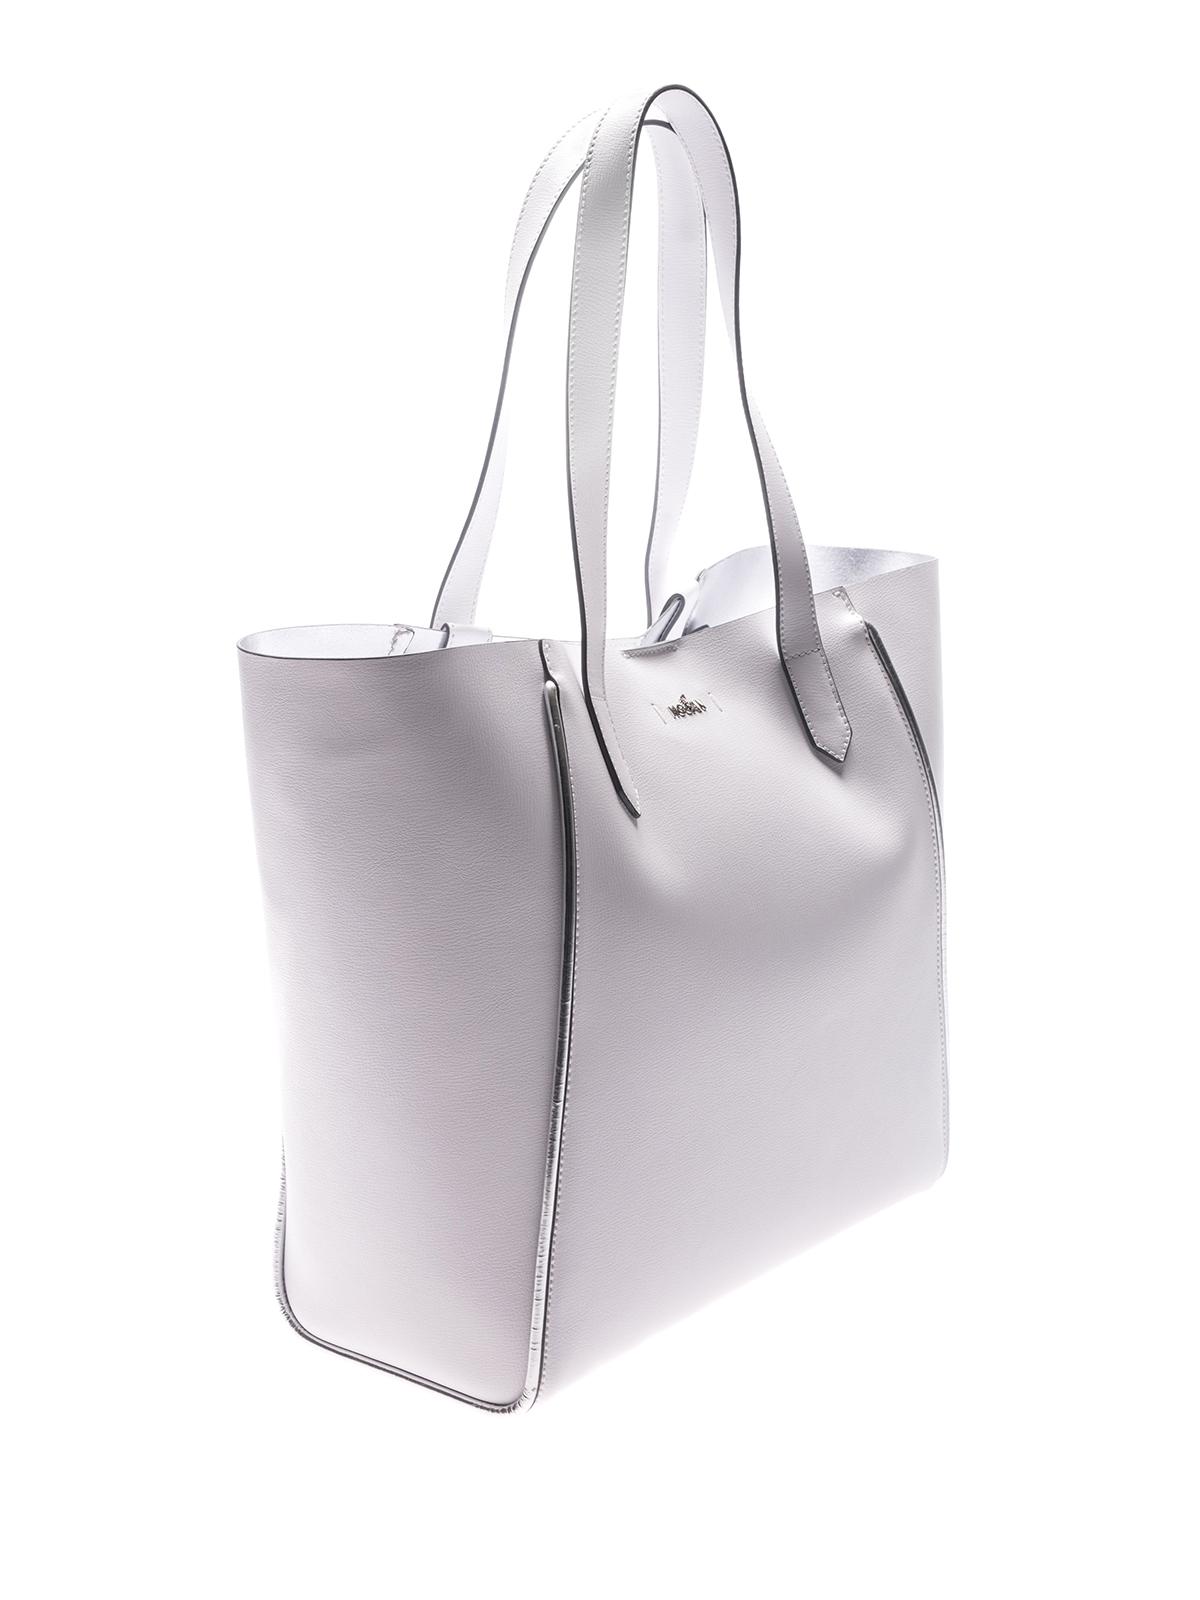 Hogan White leather shopping bag V5dEa